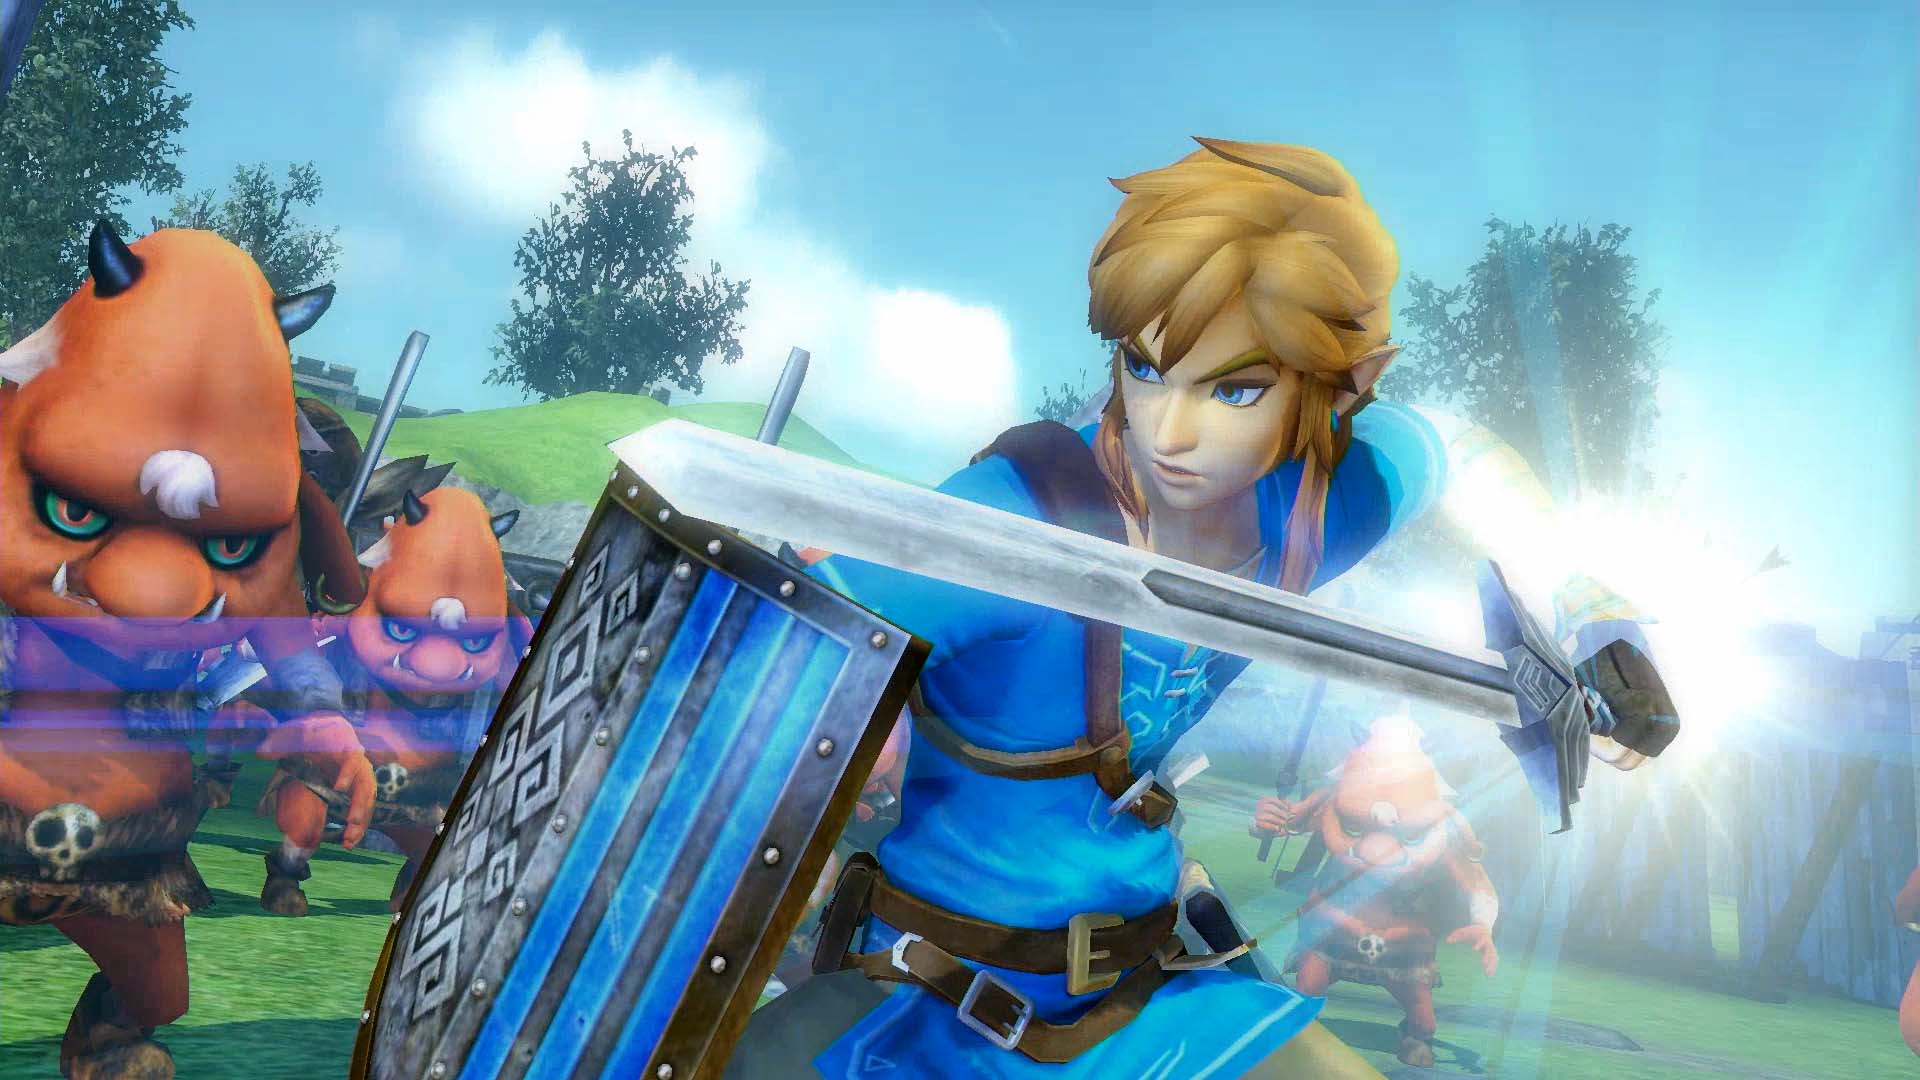 Hyrule Warriors: Definitive Edition (NS) - it looks like Zelda but tastes like Dynasty Warriors